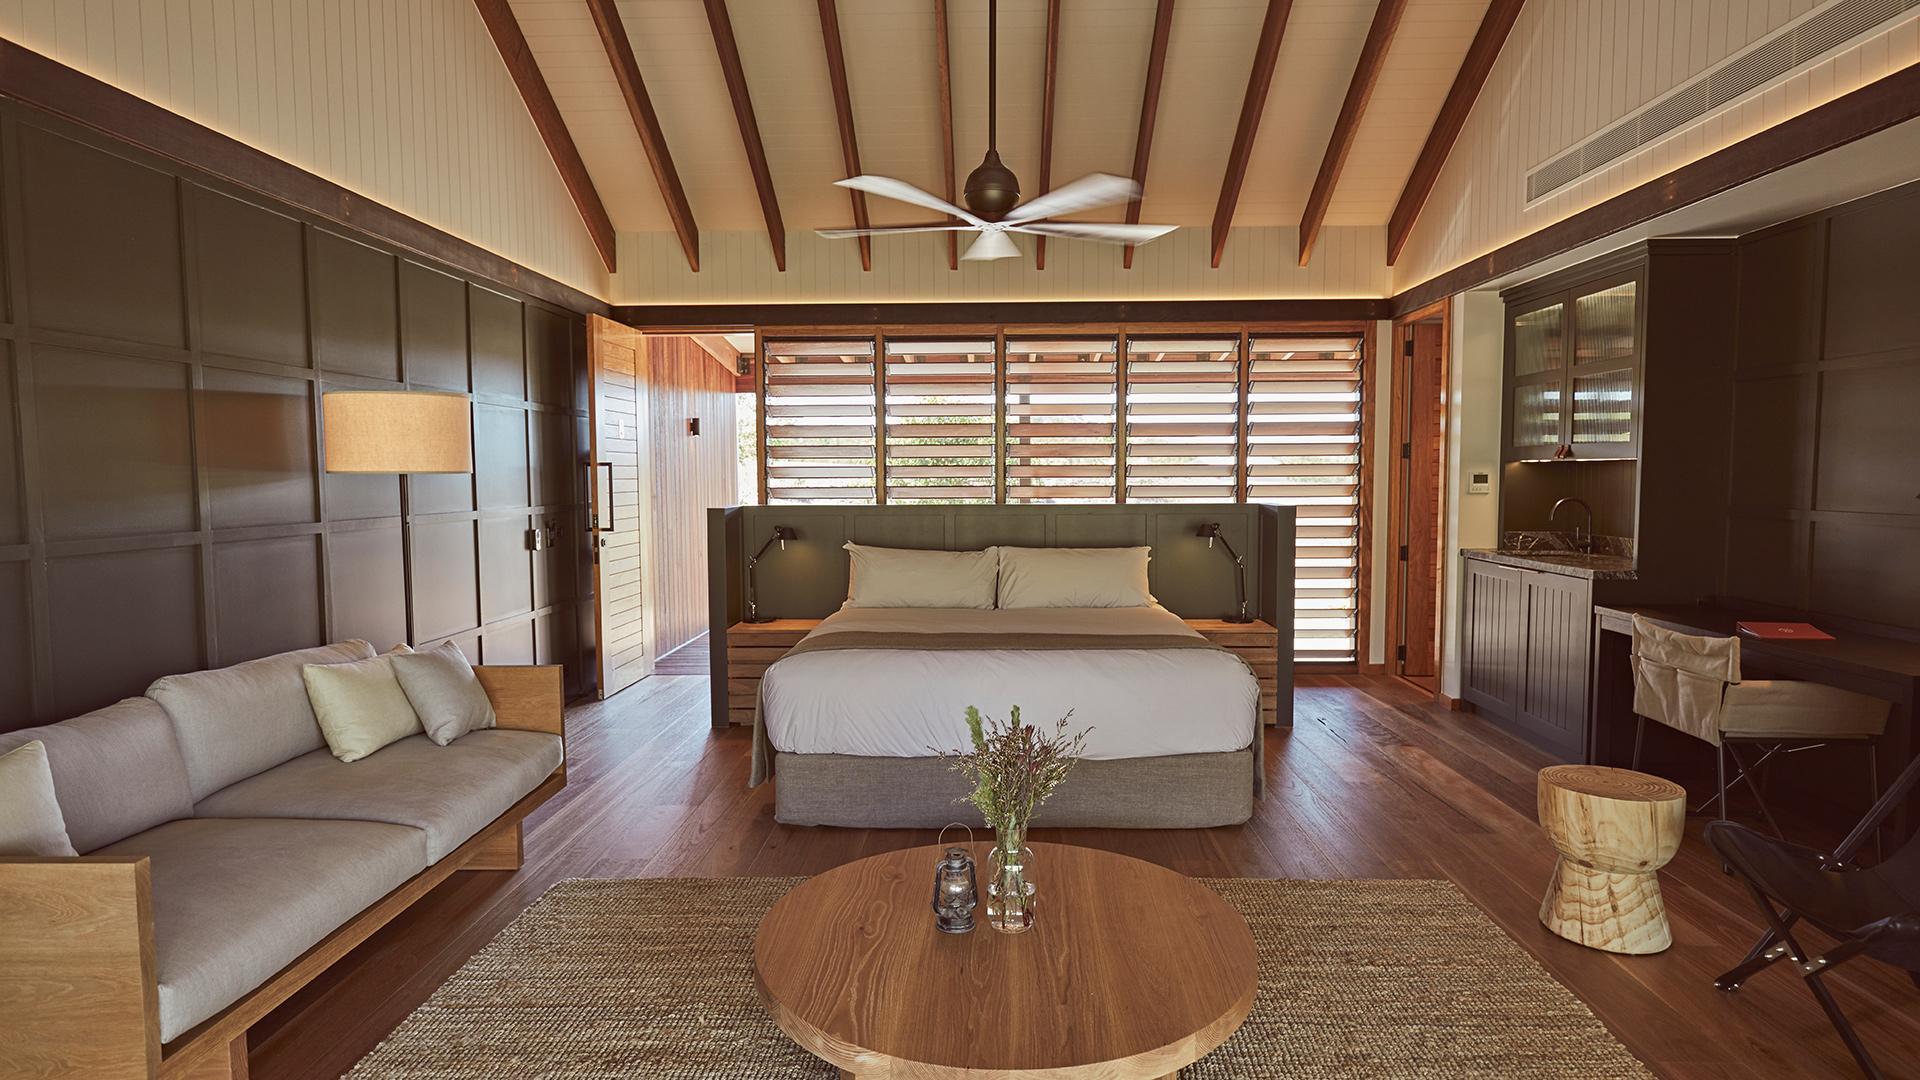 Outback Room image 1 at Mt. Mulligan Lodge by Mareeba Shire, Queensland, Australia